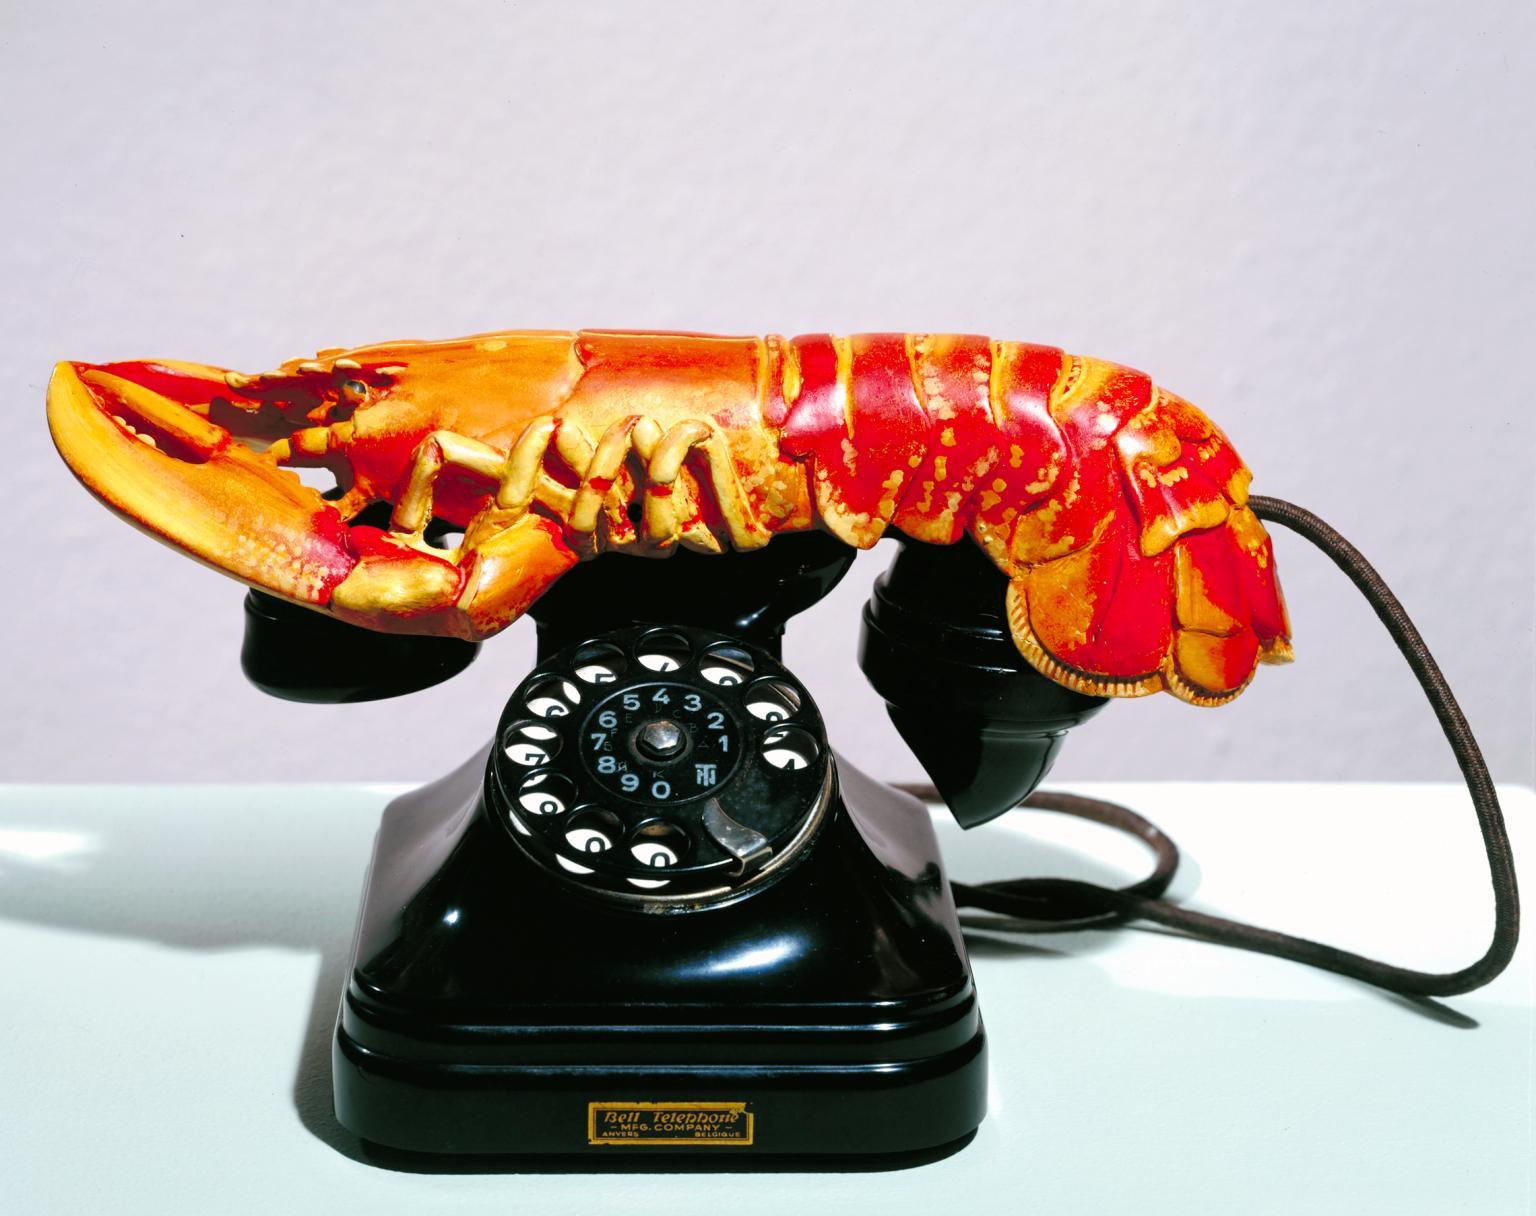 Salvador Dalí, Lobster Phone (1936; acciaio, gesso, gomma, resina e carta, 17,8 x 33 x 17,8 cm; Londra, Tate Modern)